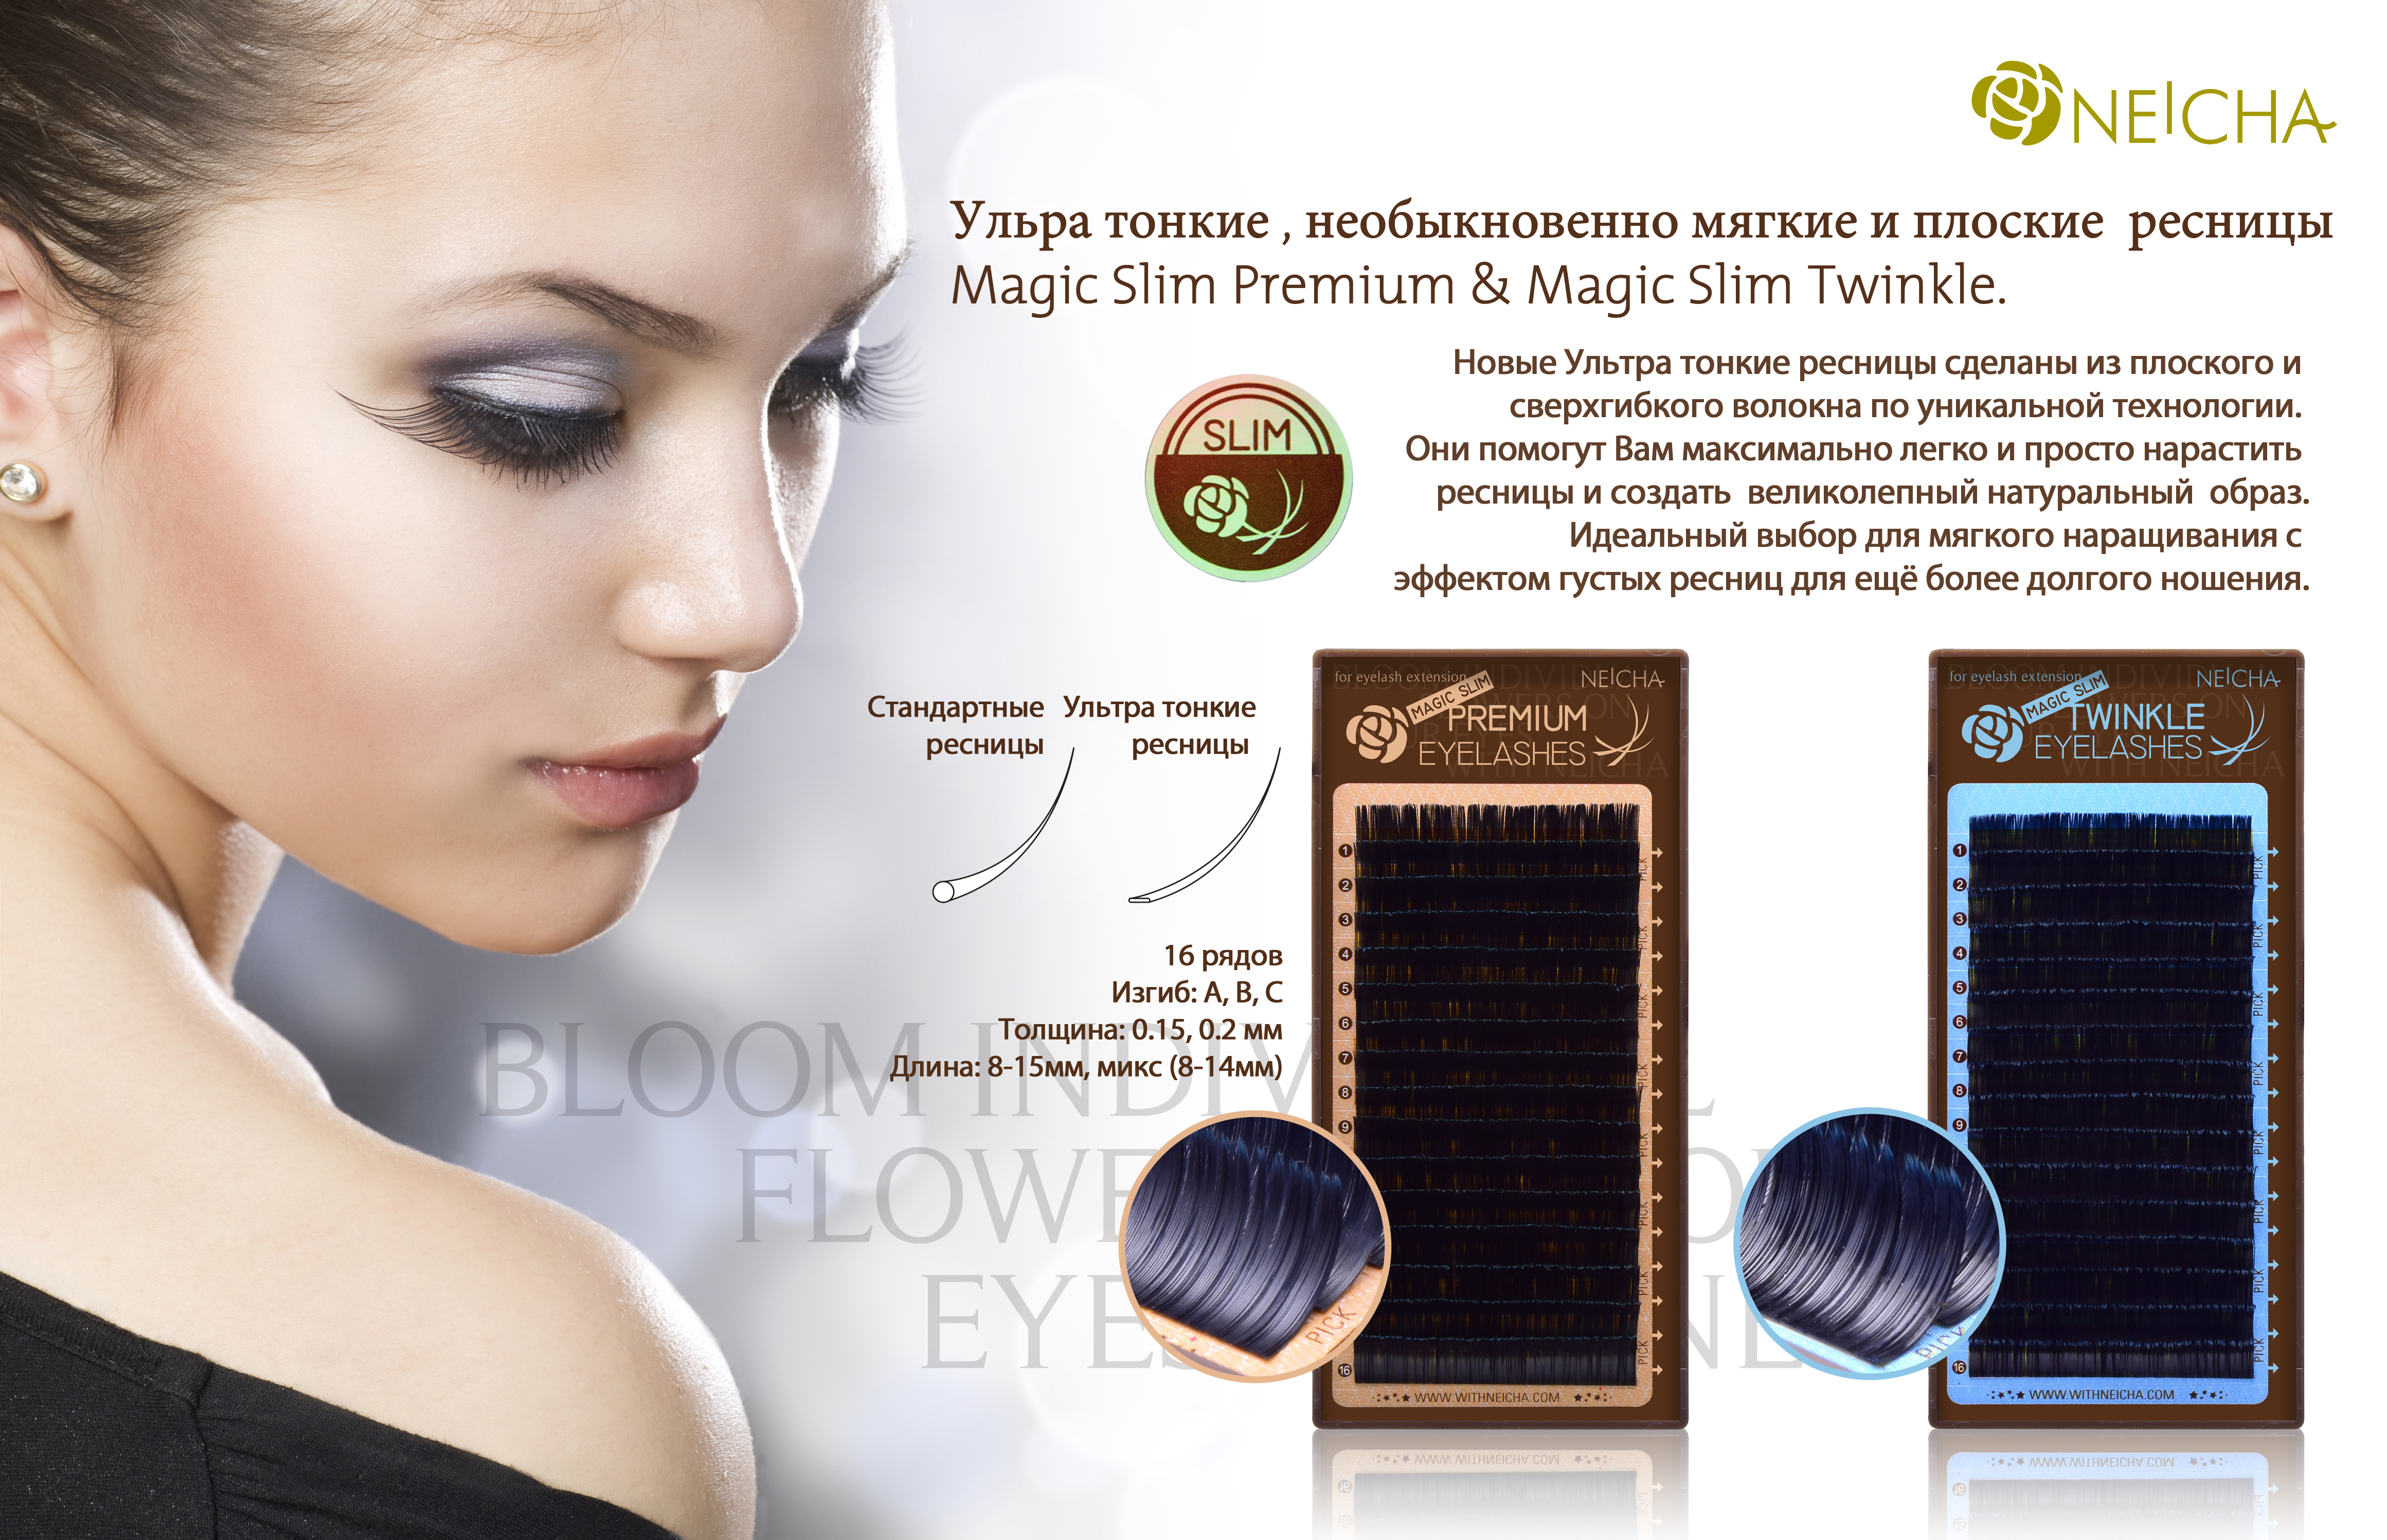 neicha_magic_slim_tw.jpg